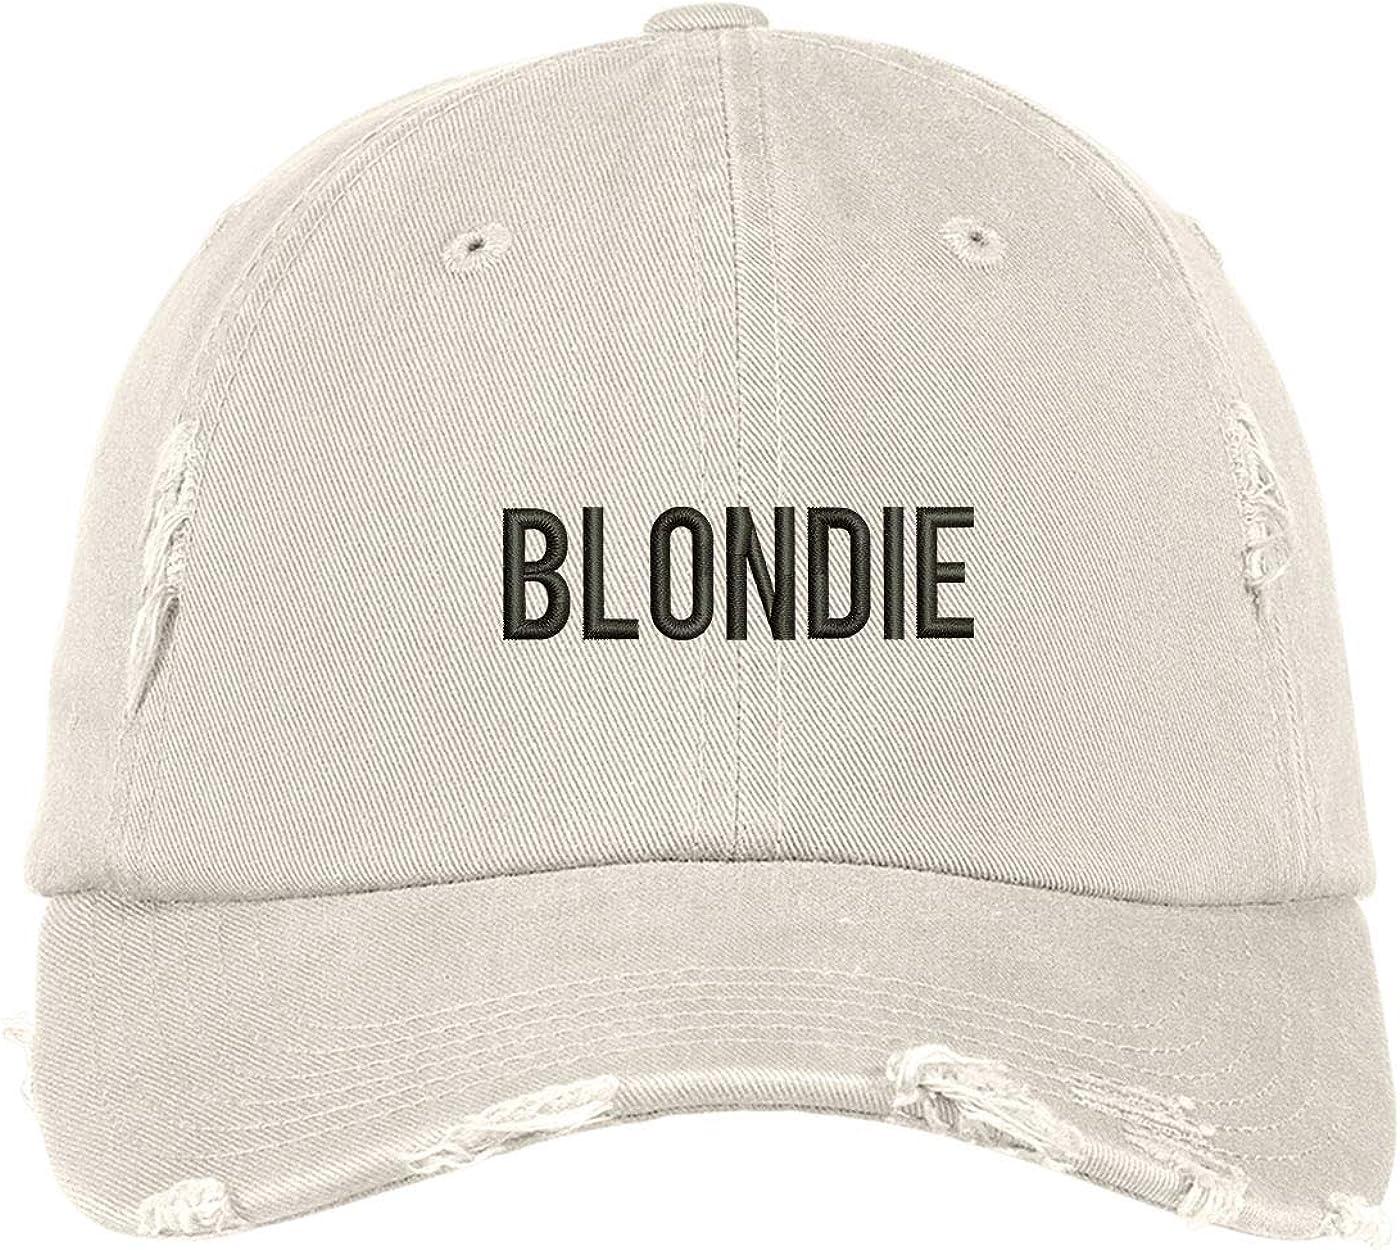 Prfcto Lifestyle Blondie Distressed Baseball Cap - Unisex Baseball Cap